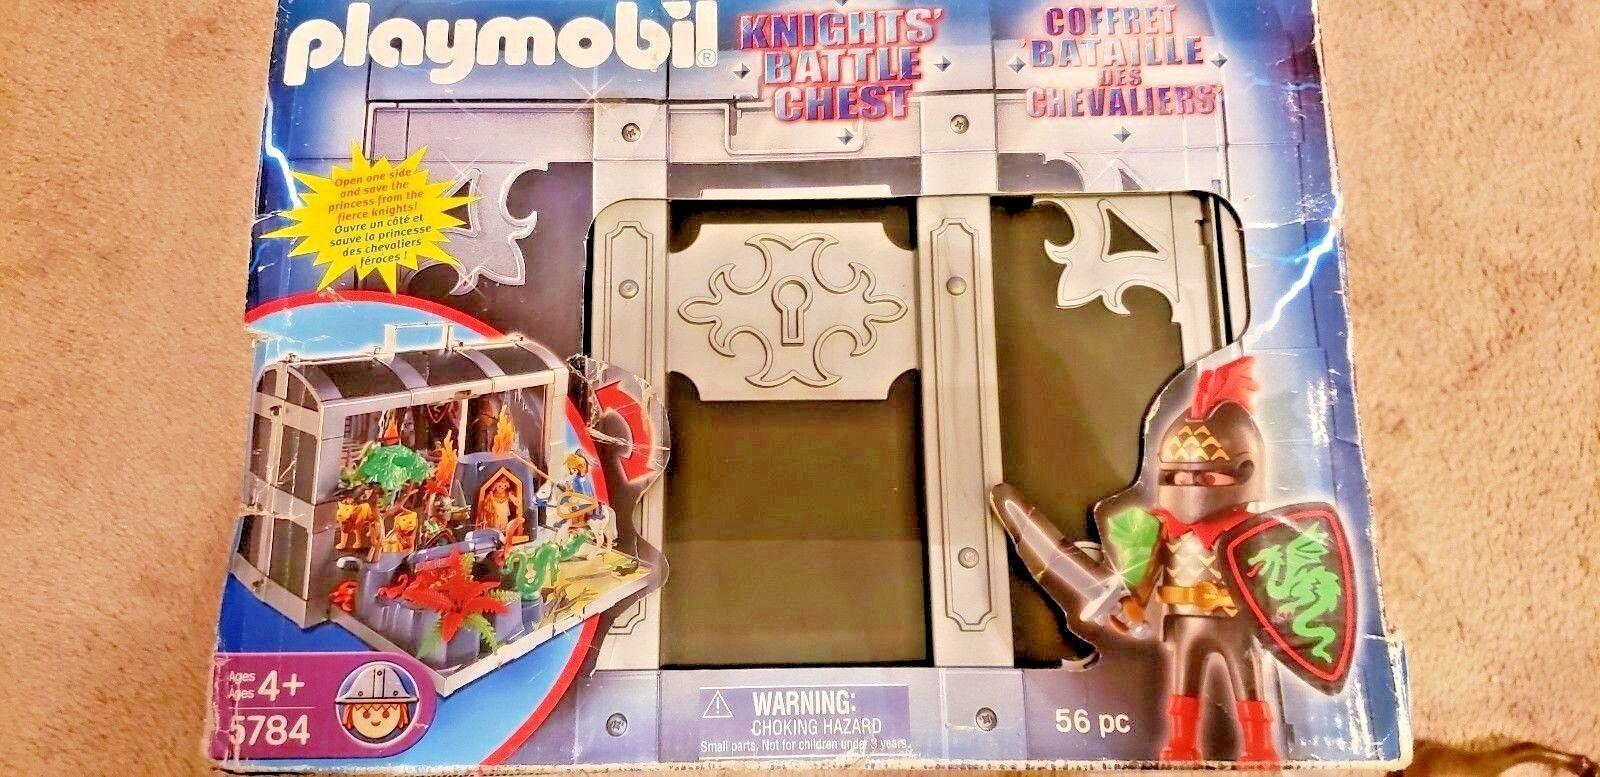 Playmobil Knights Battle Chest Set 5784